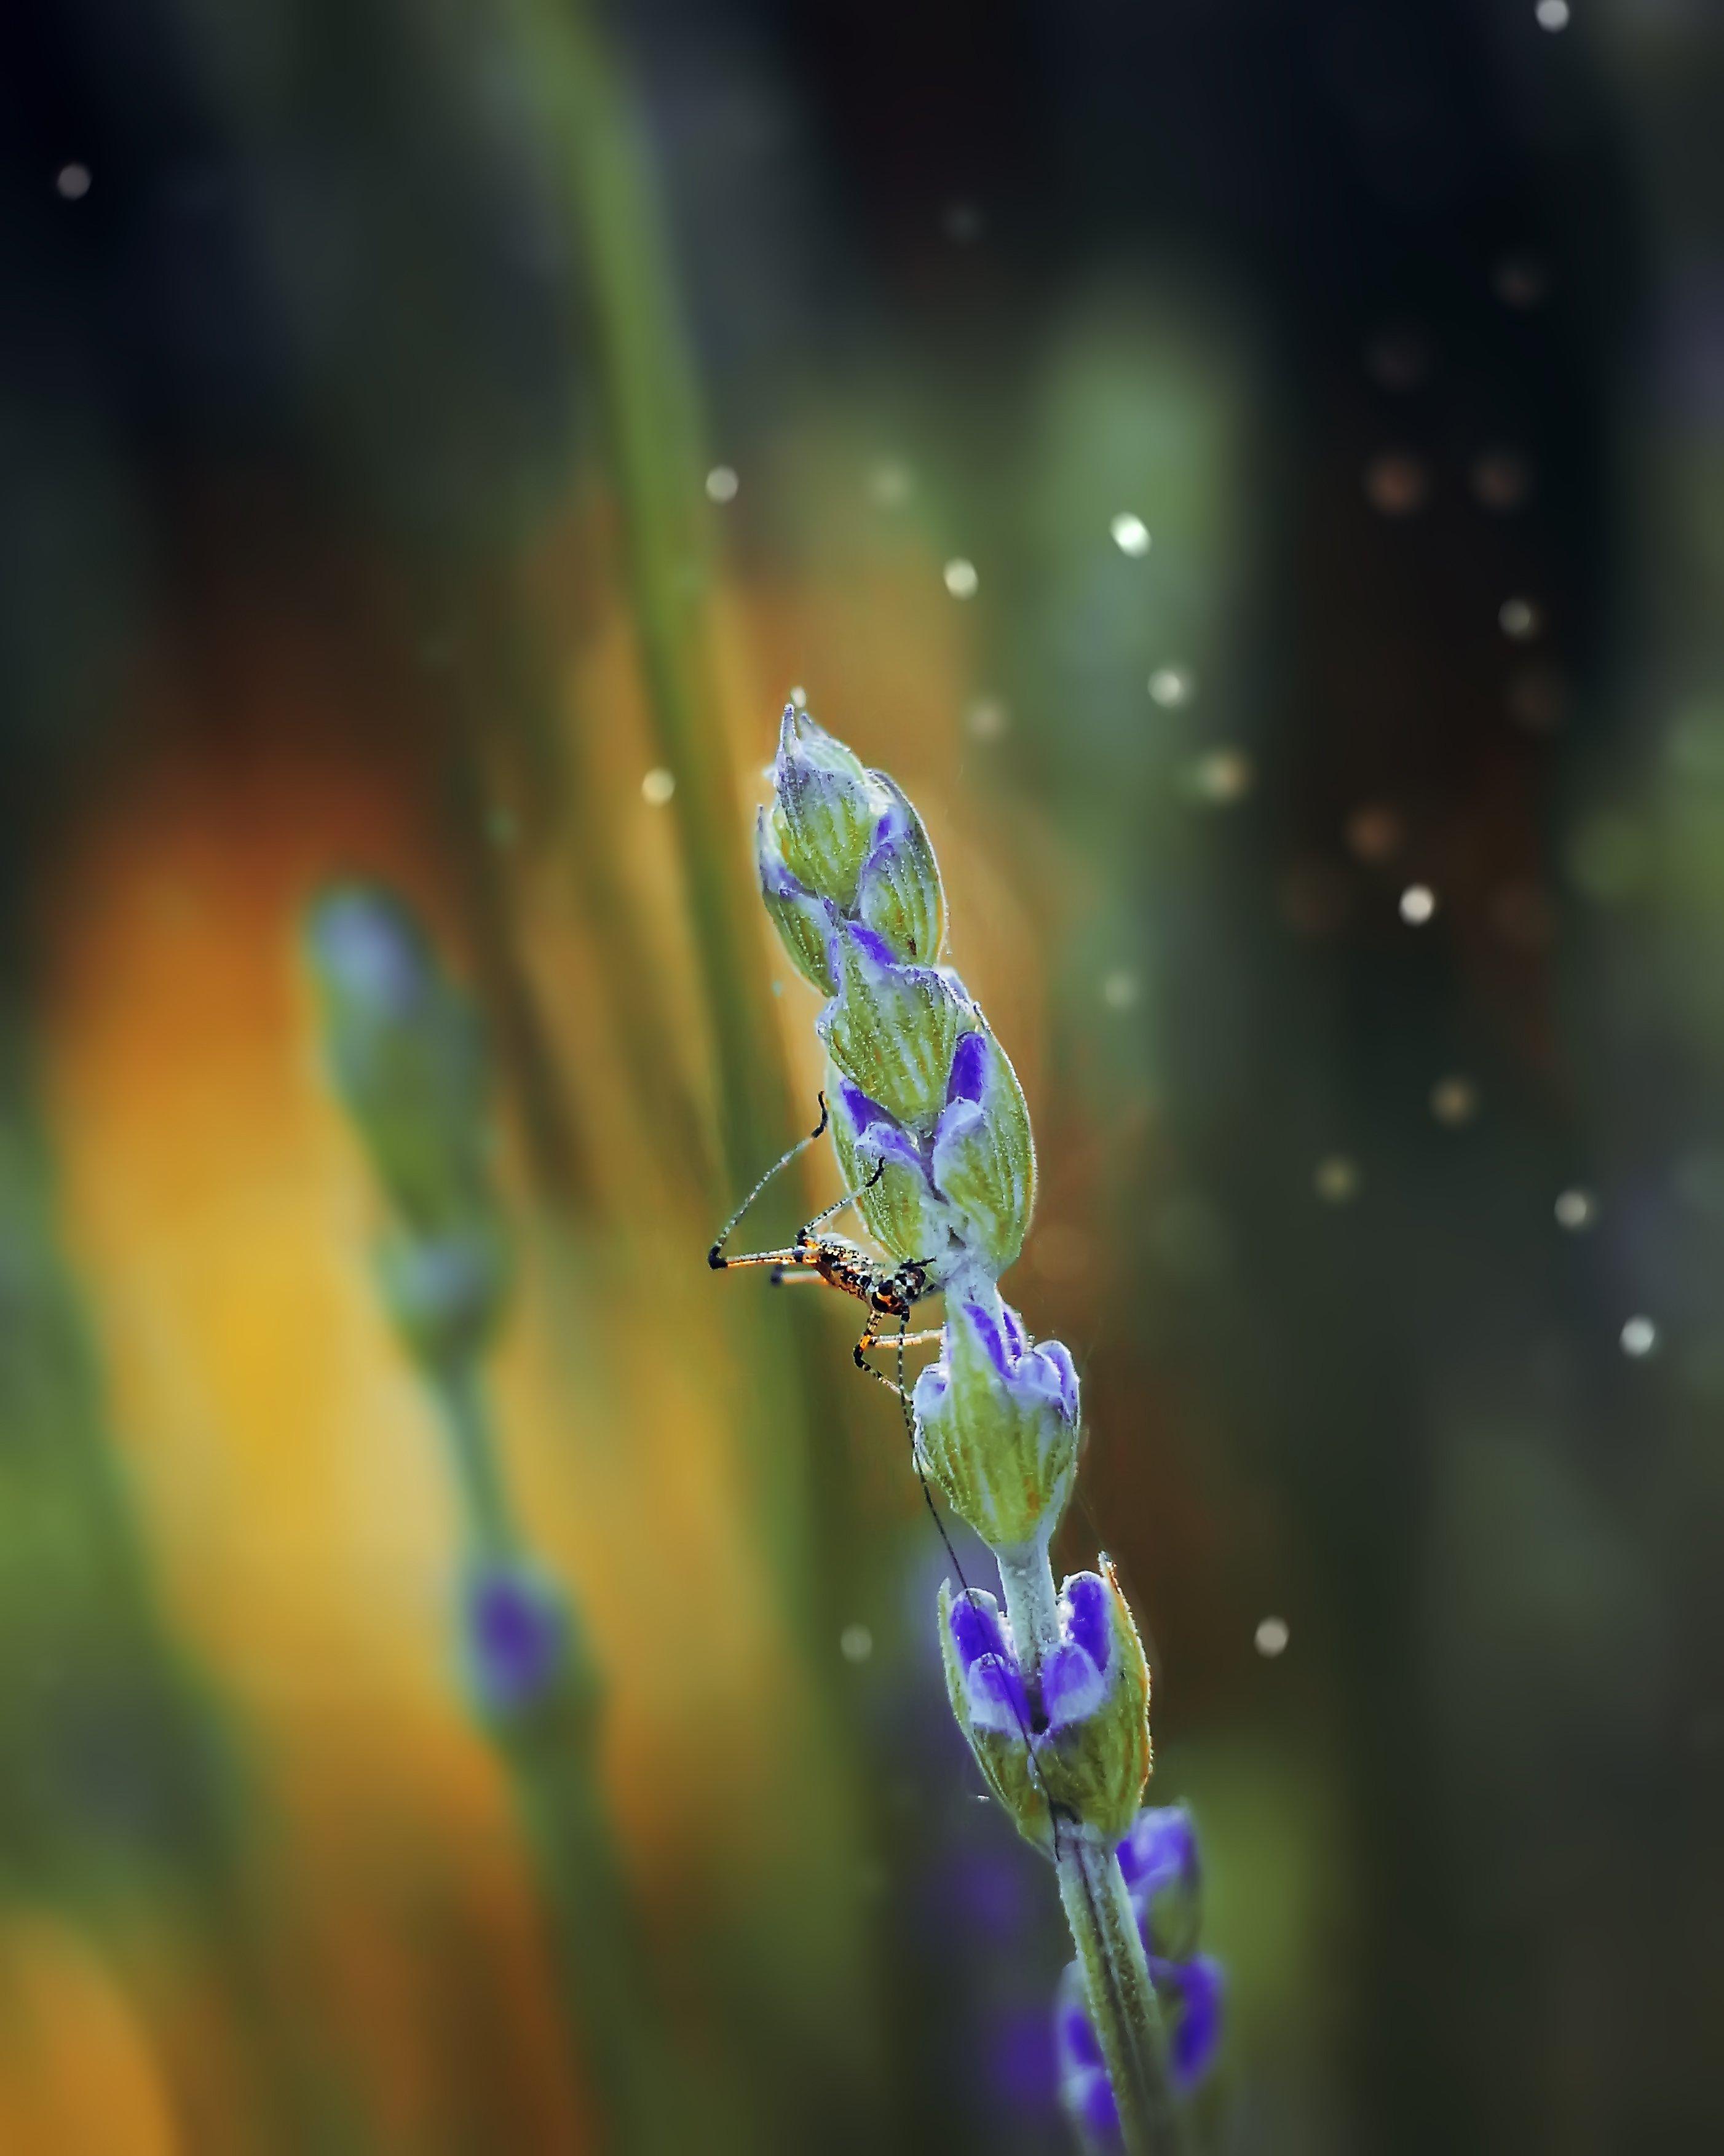 macro bokeh insect helios44-2 helios nature, Анастасия Колесникова